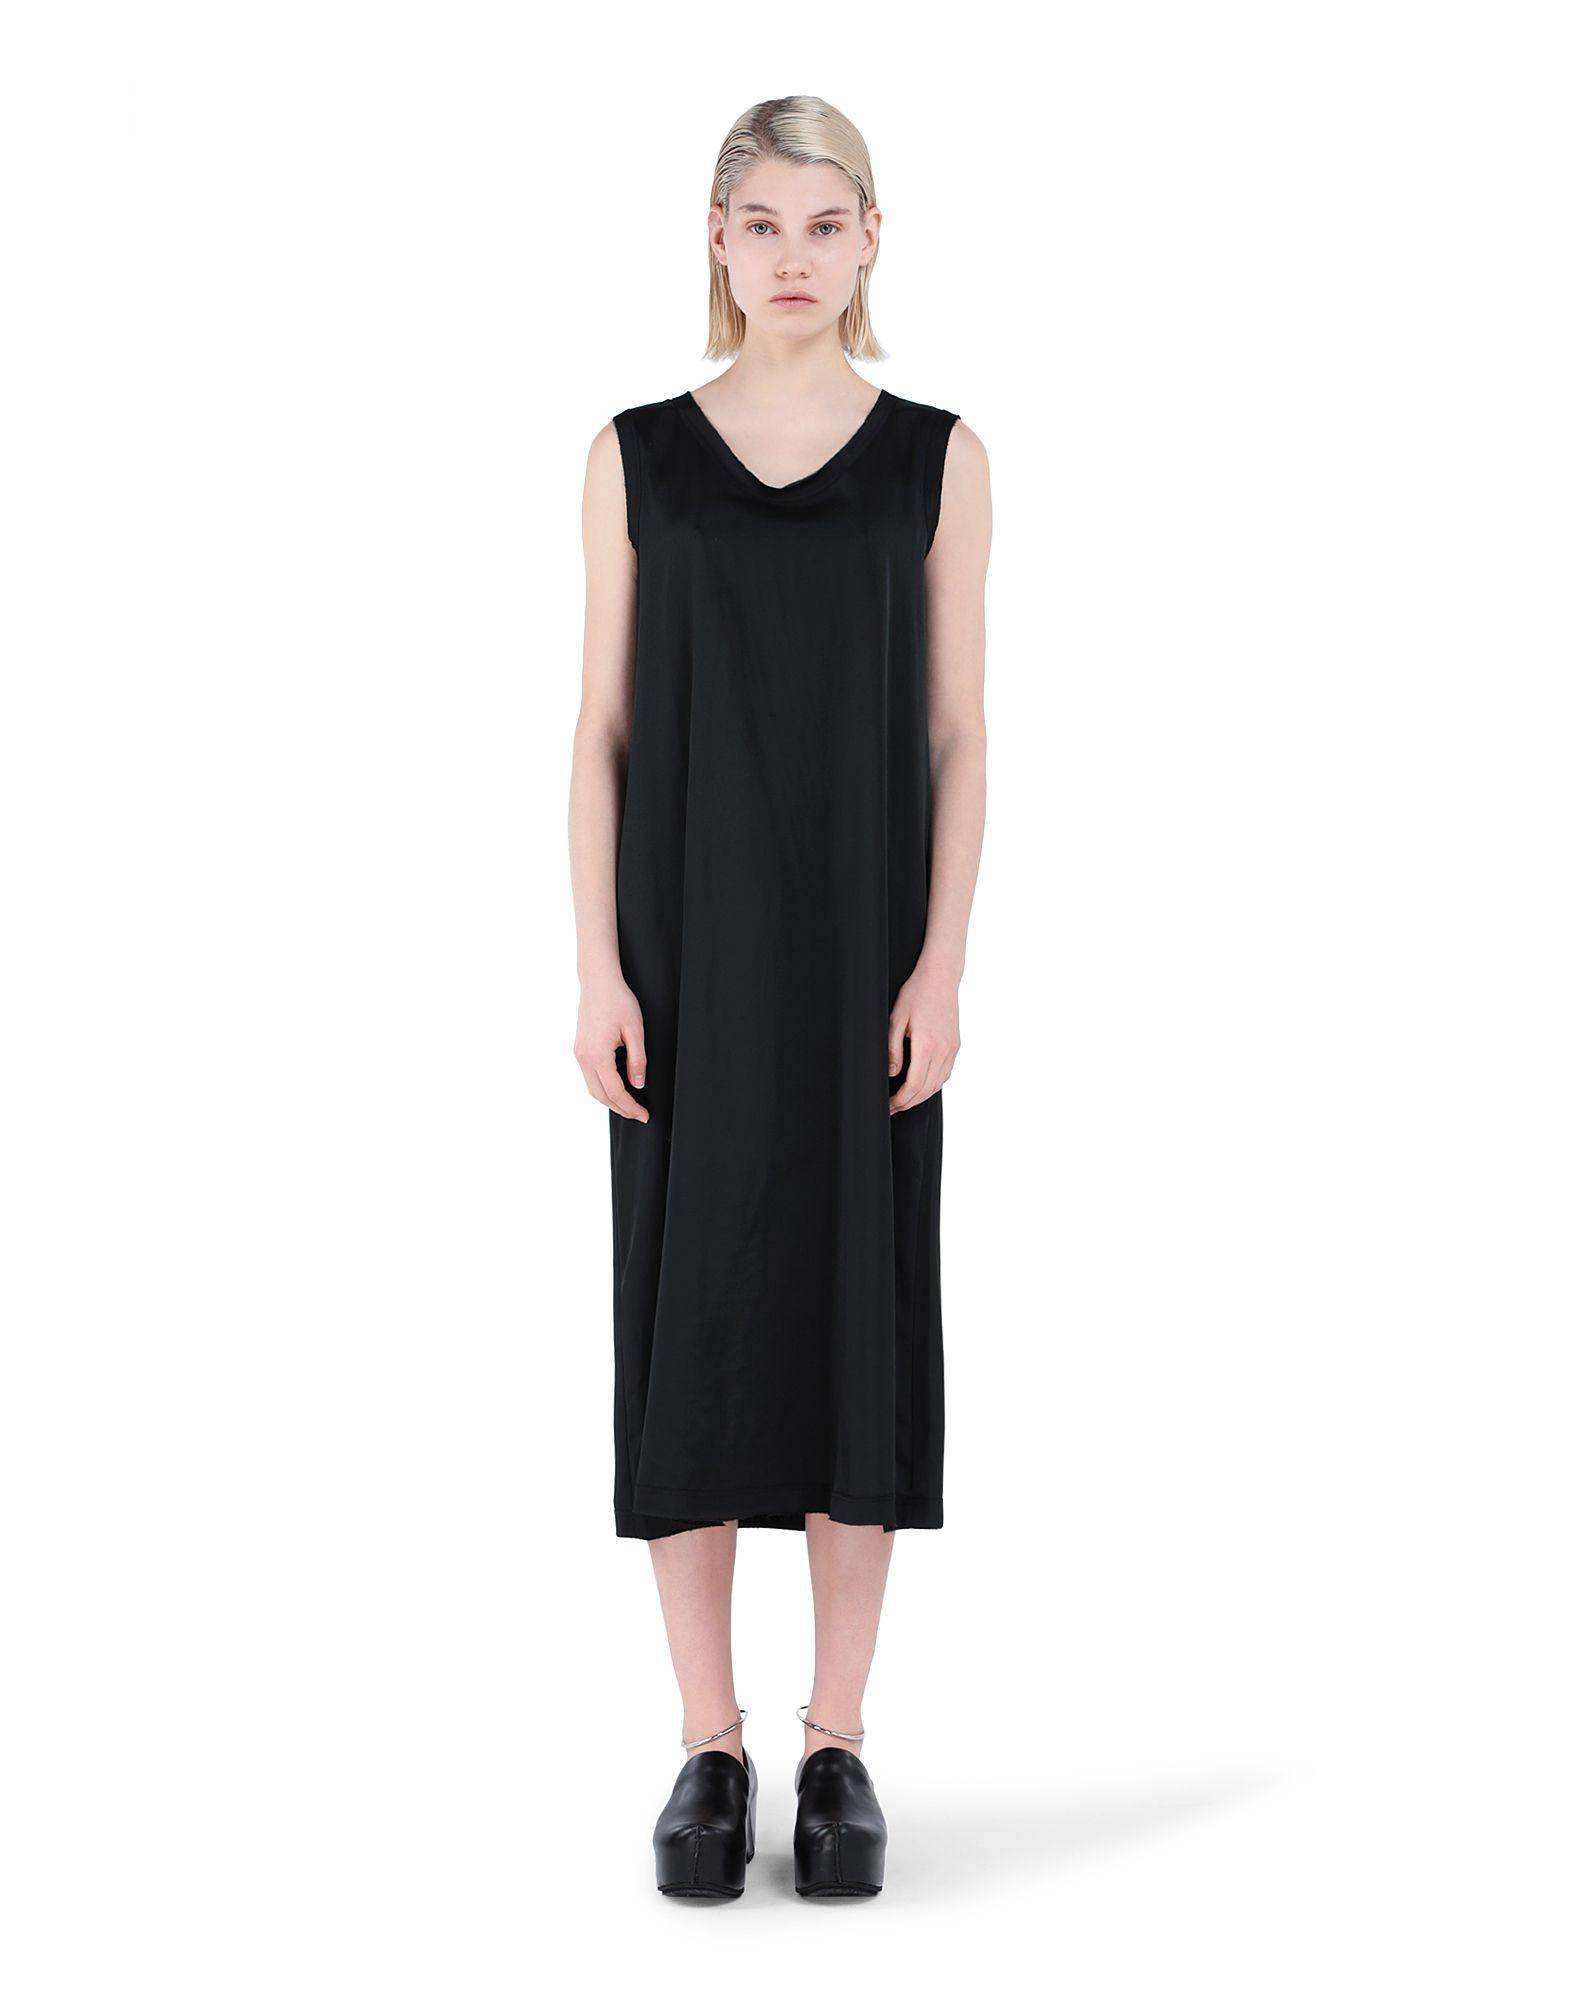 Unterkleid - JIL SANDER Online Store